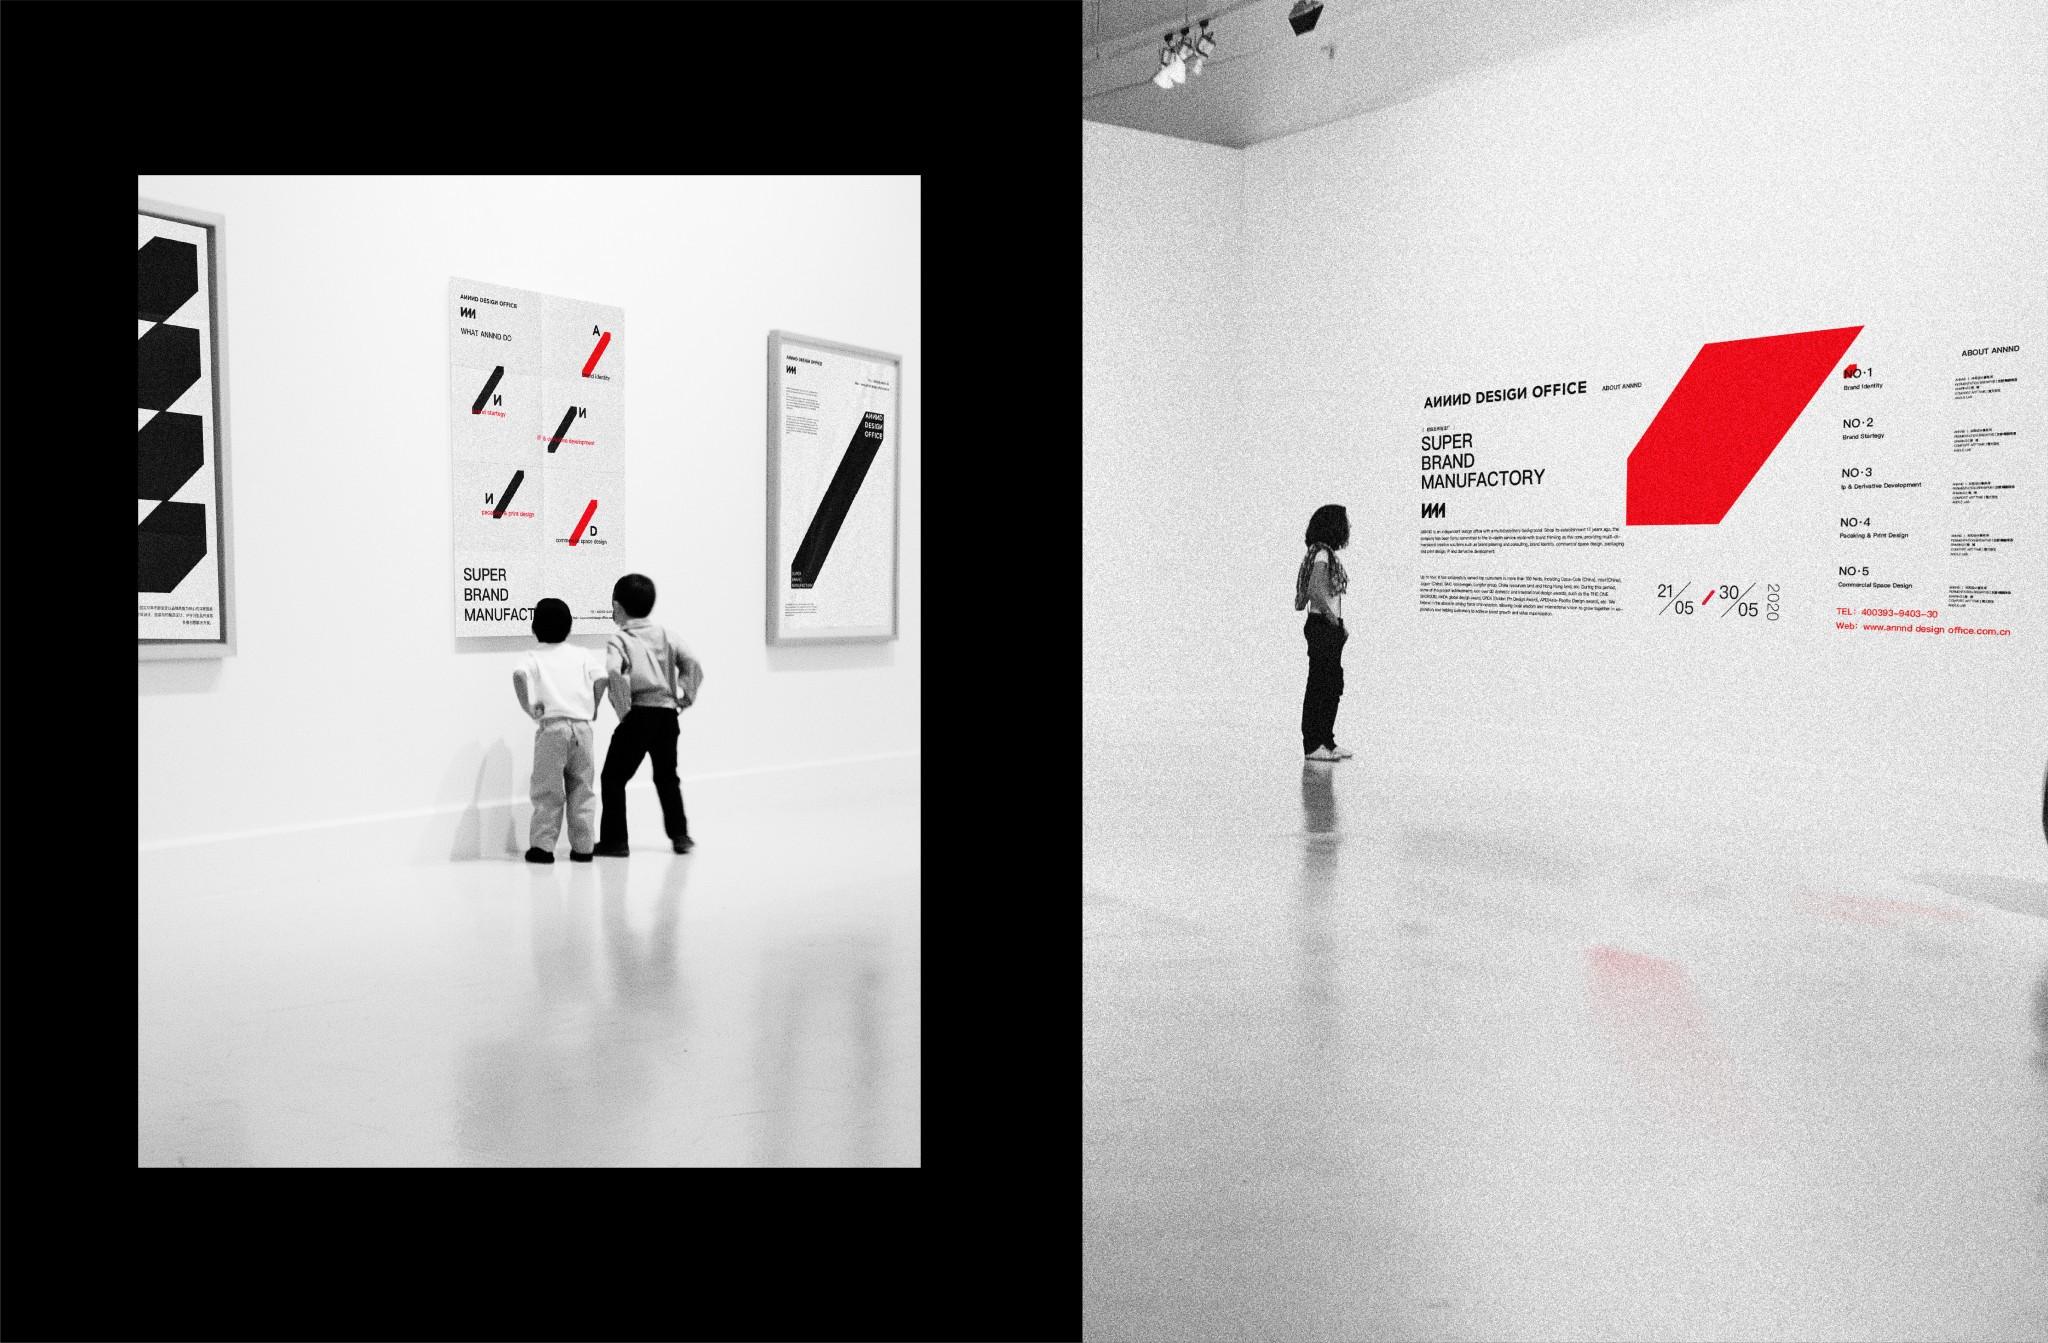 ANNND 展览-02